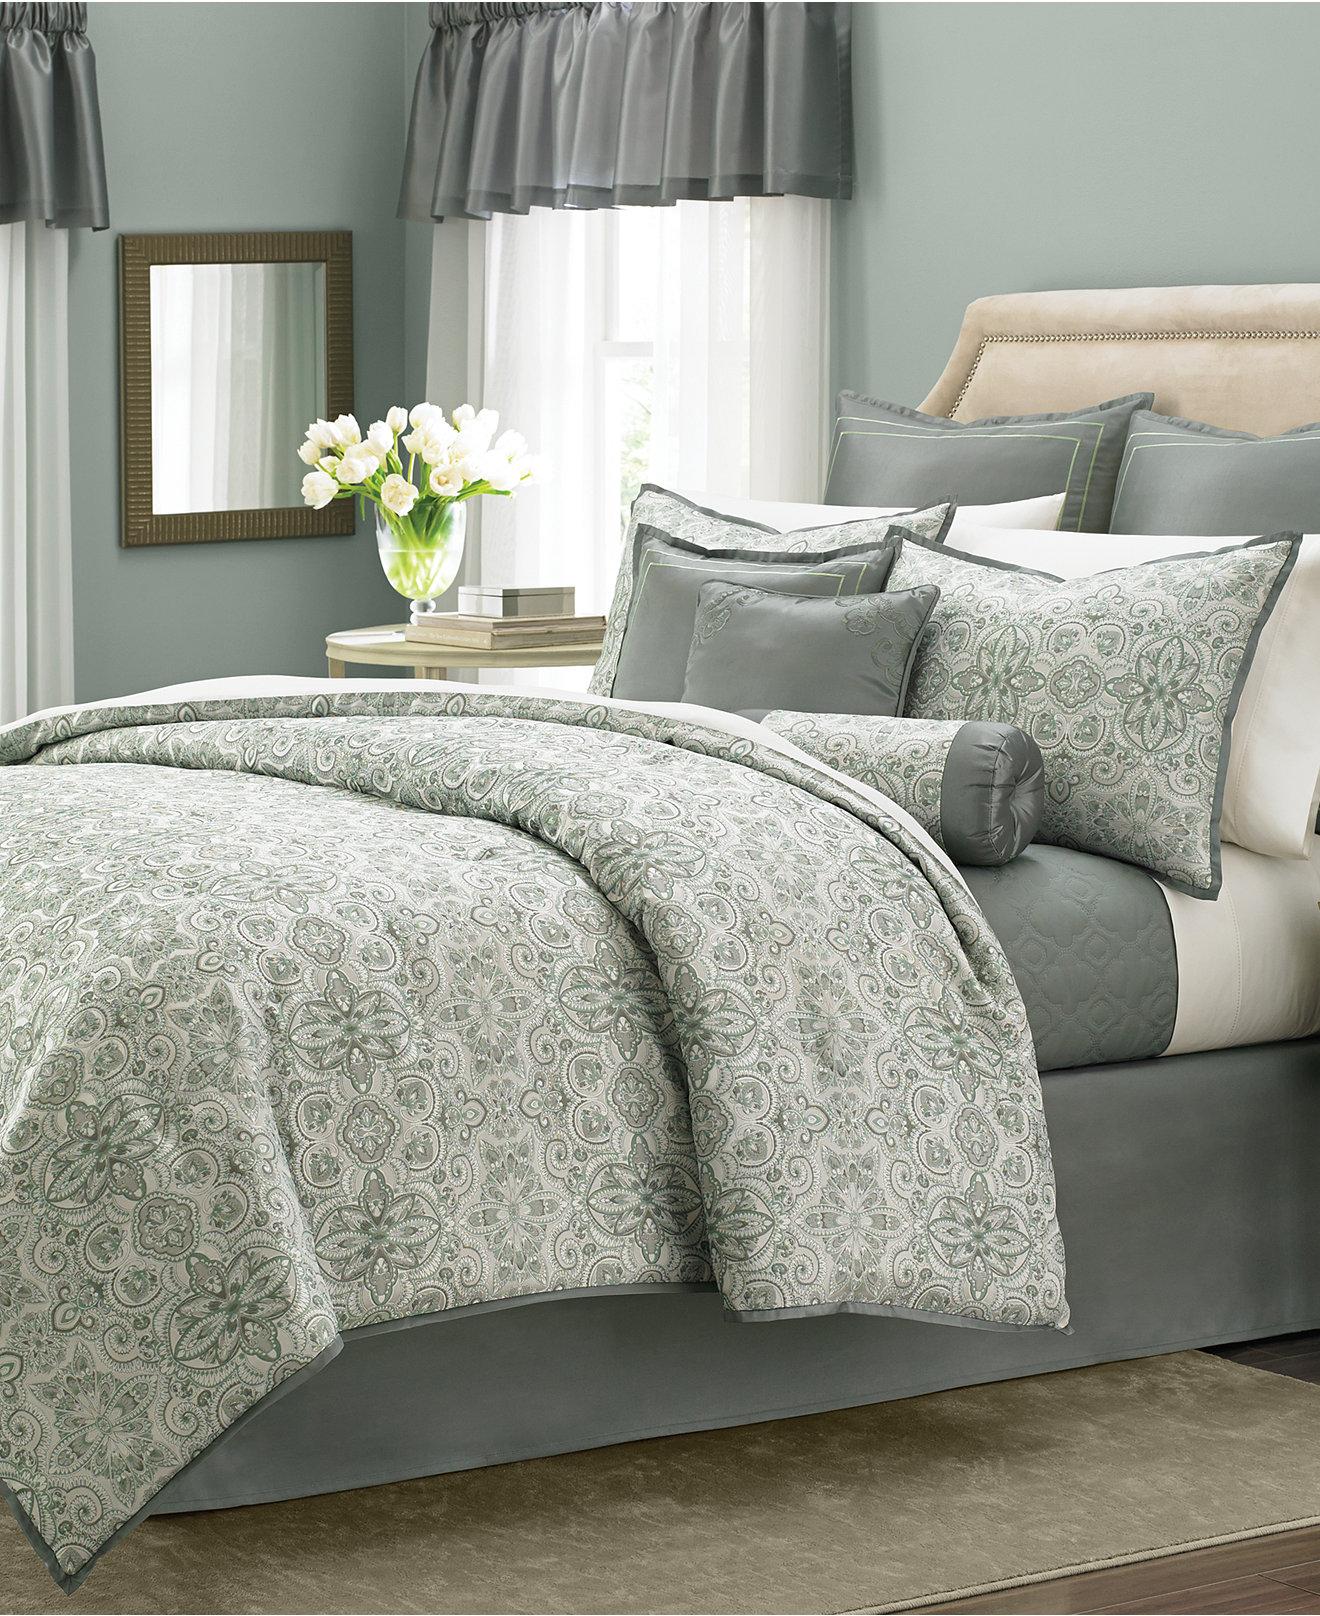 dillards collections comforter bedding brand pale lauren sets blue zi home ralph